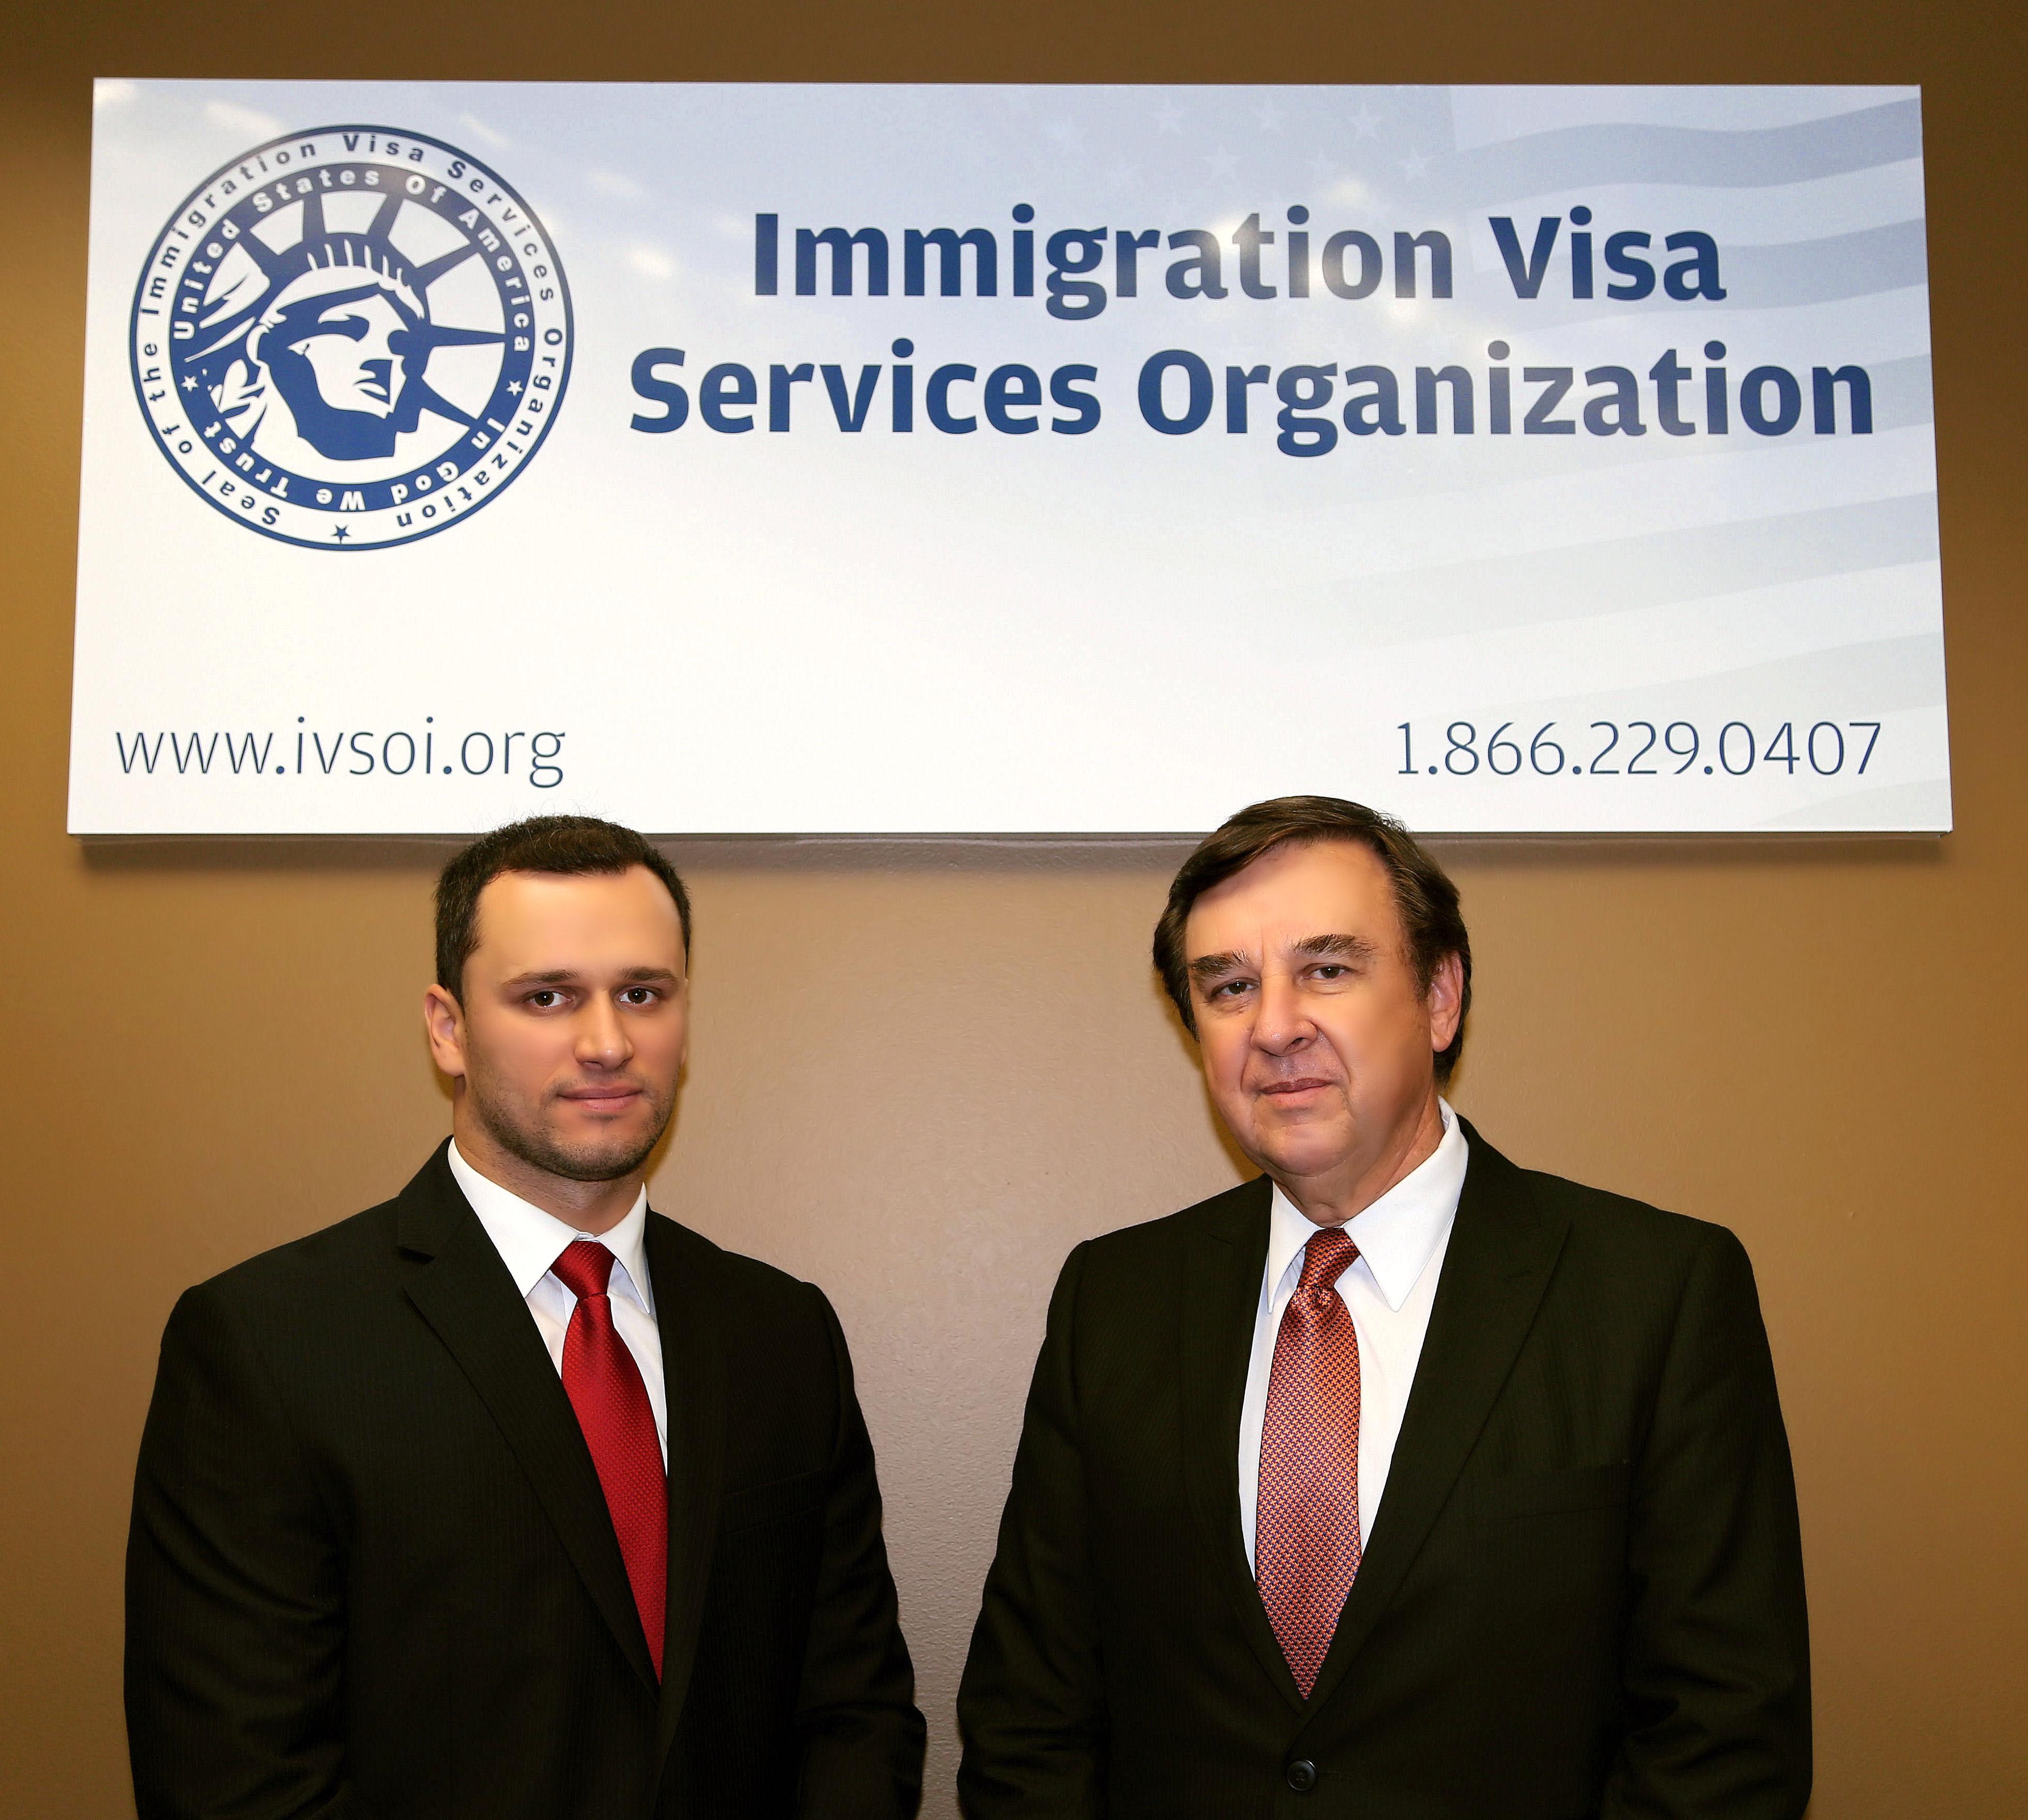 Immigration Visa Services Organization - ad image